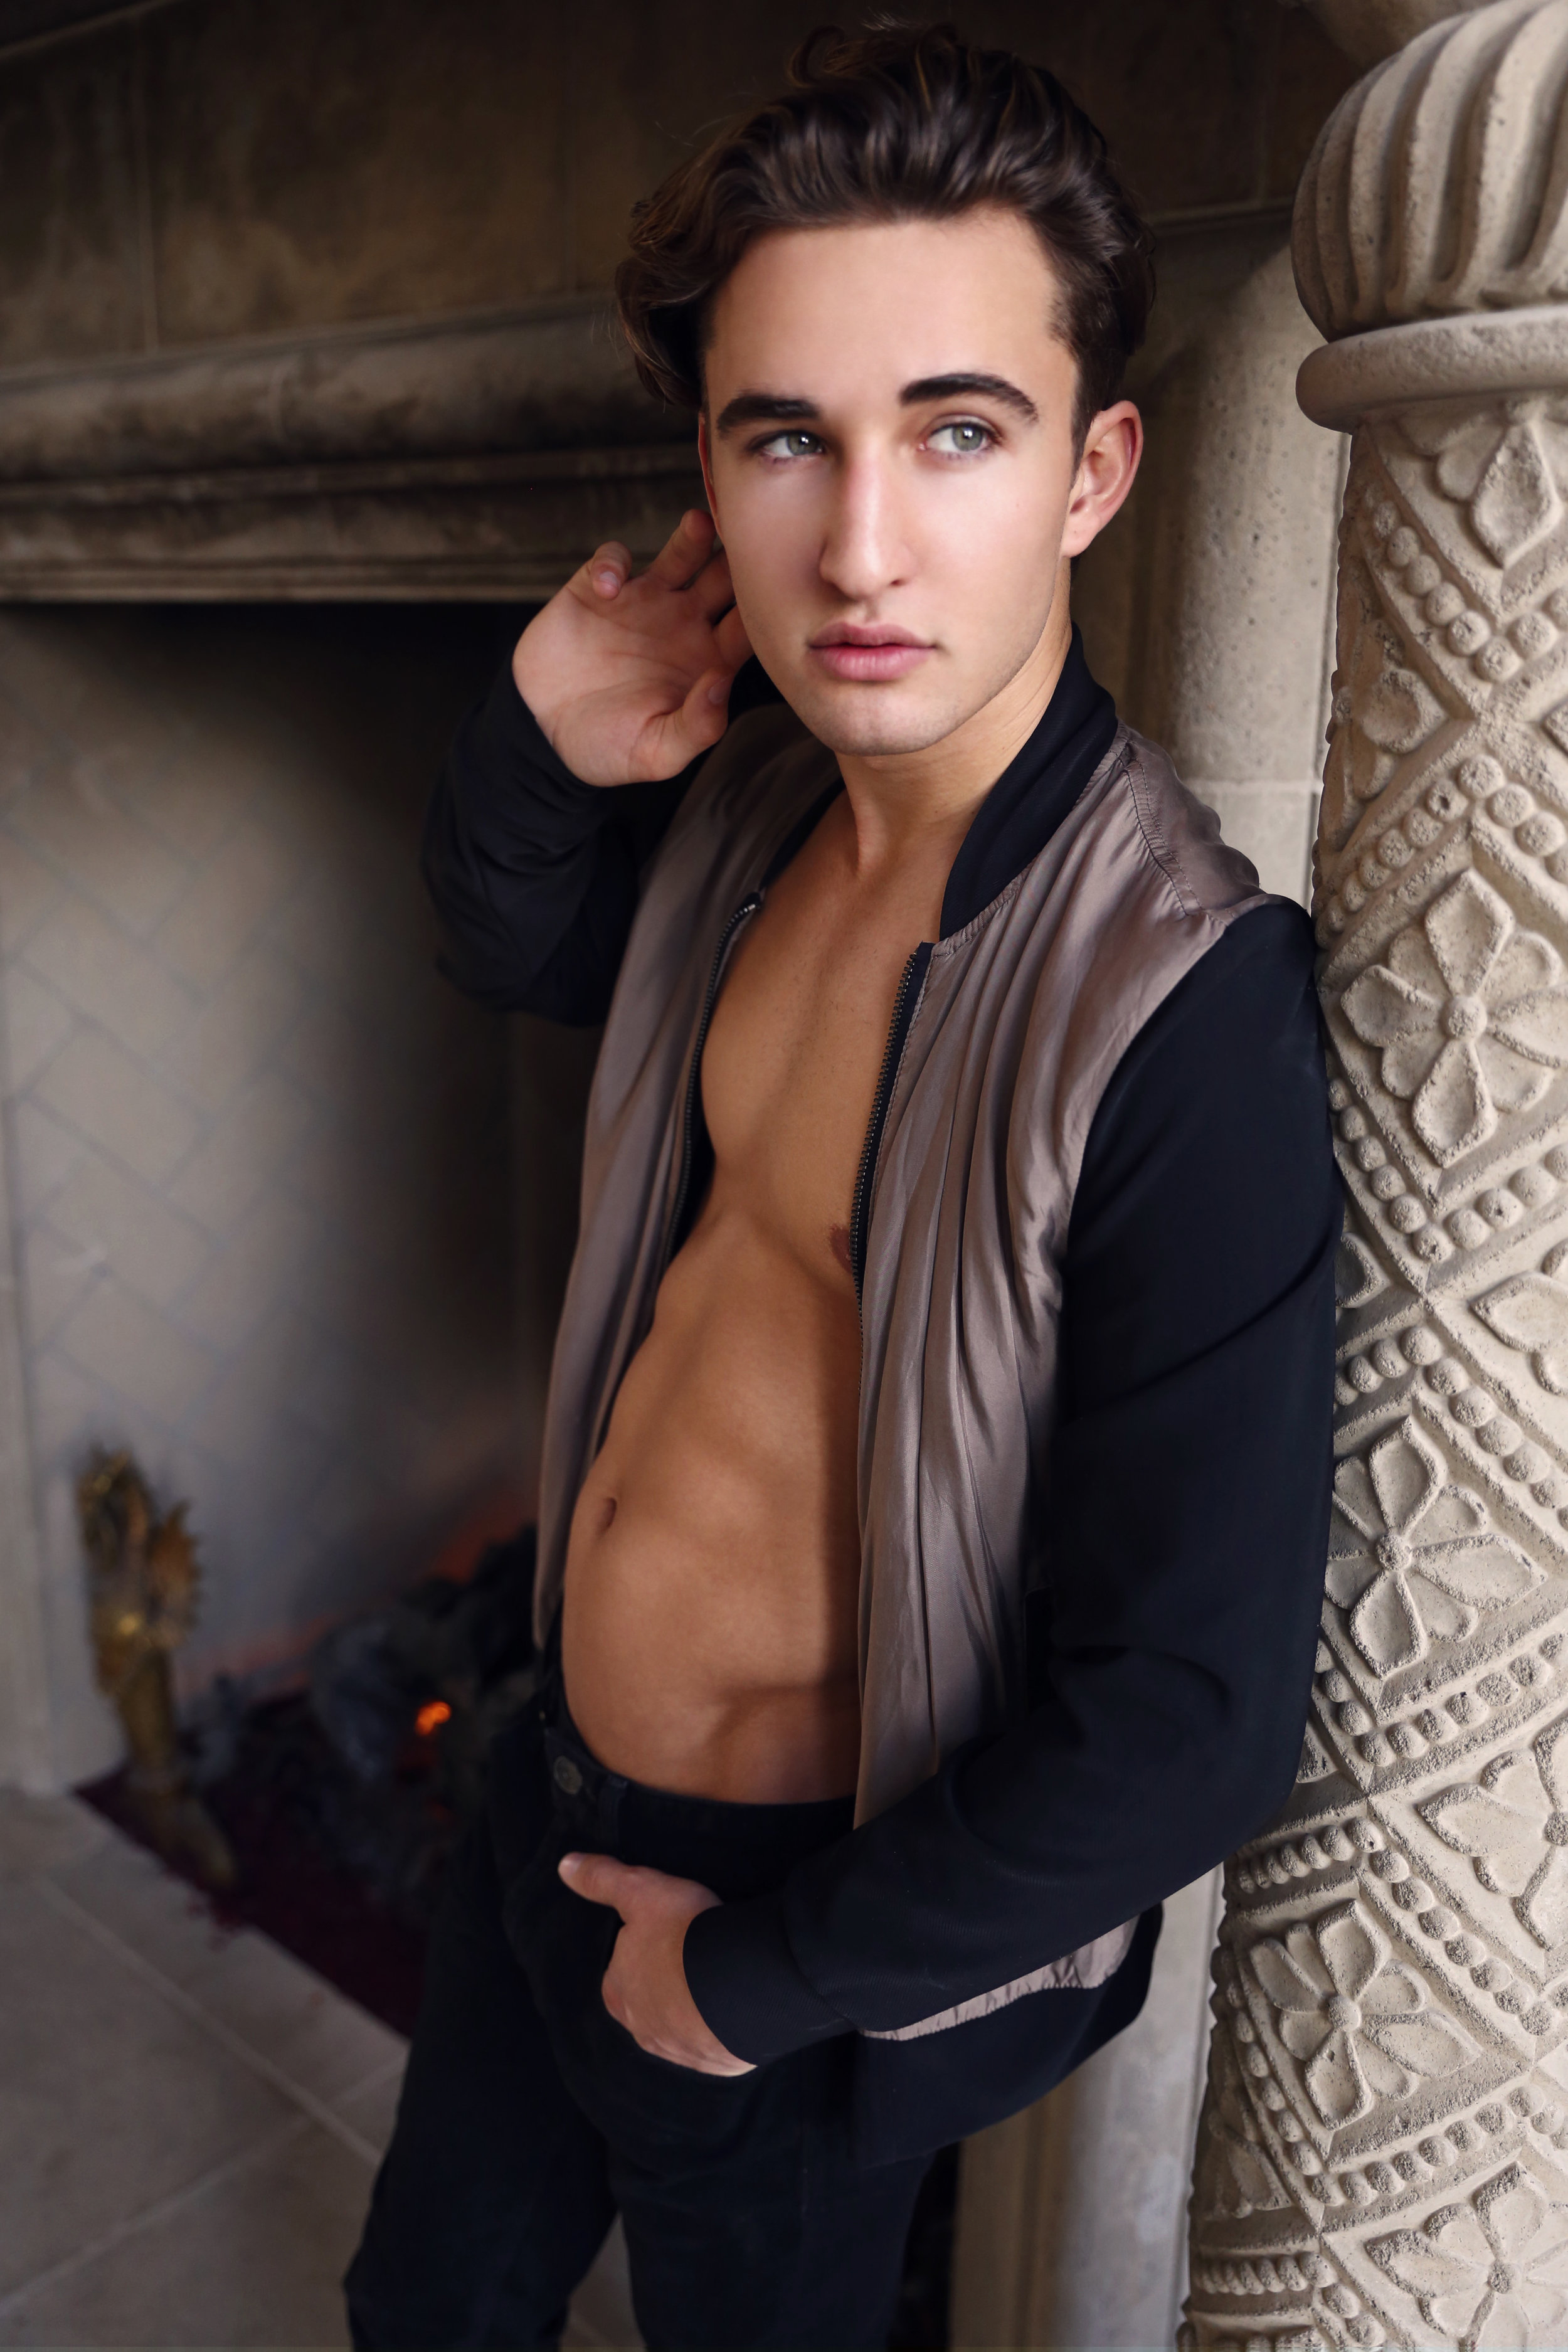 Ethan Willhouse